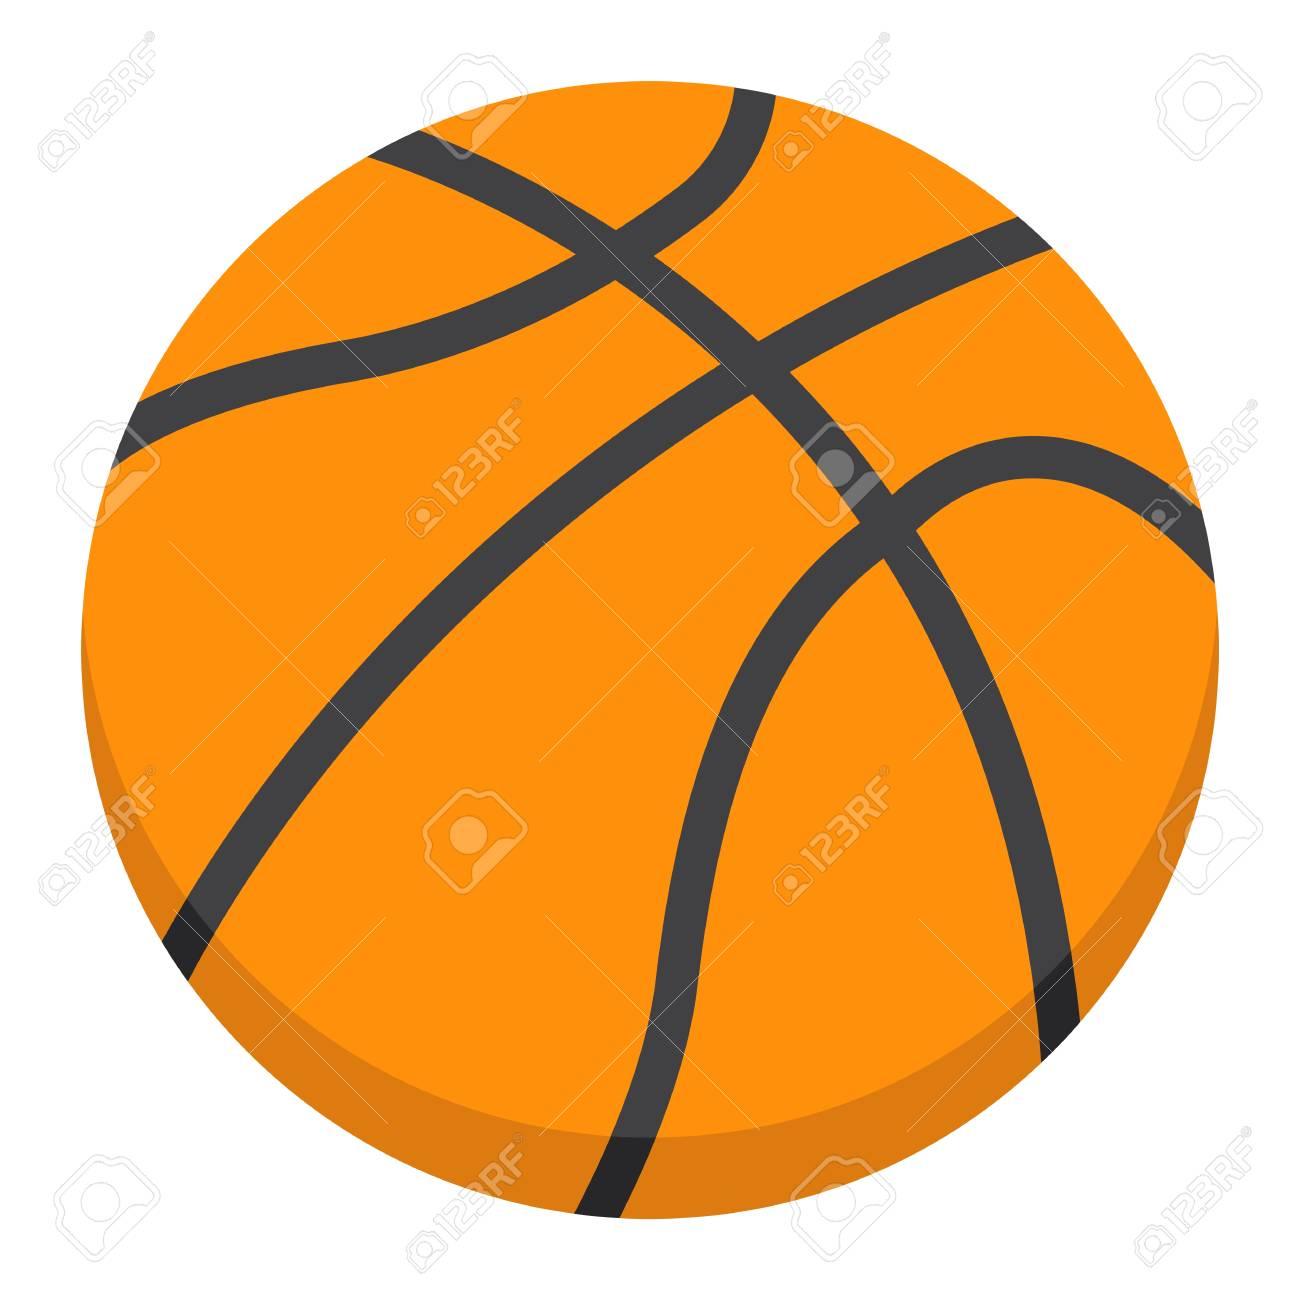 basketball ball flat icon sport and game vector graphics a rh 123rf com basketball graphics clipart basketball graphics design